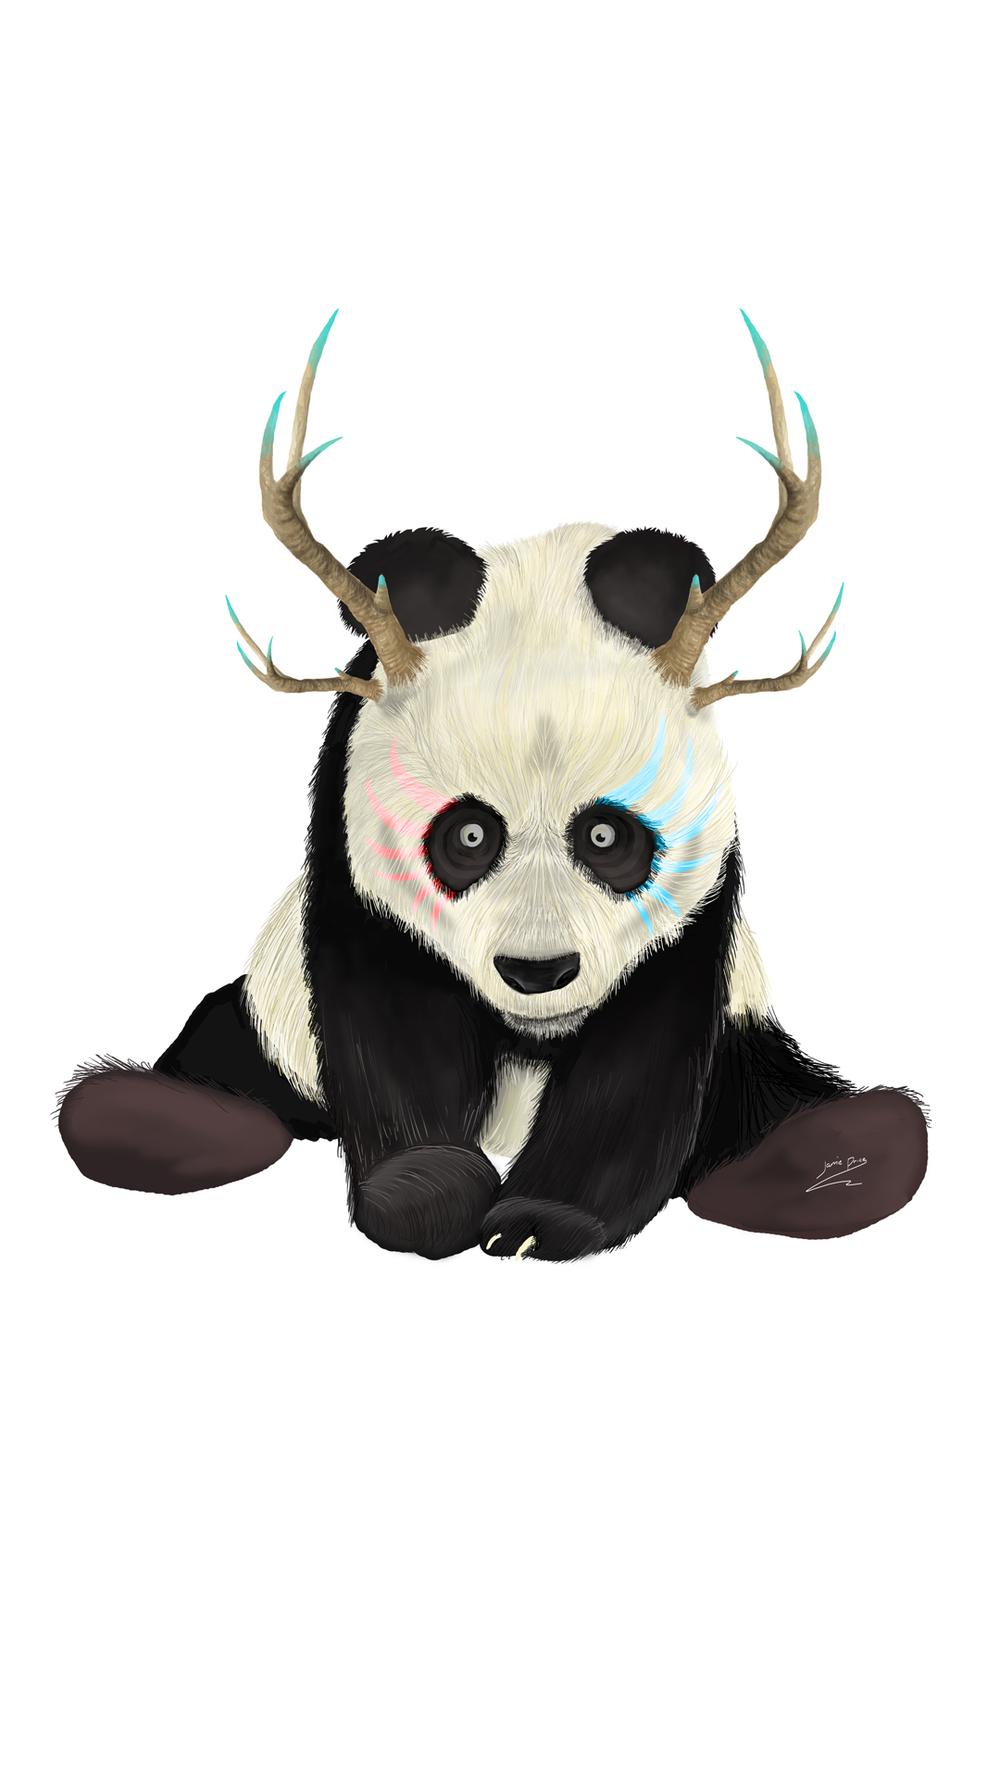 King the Panda